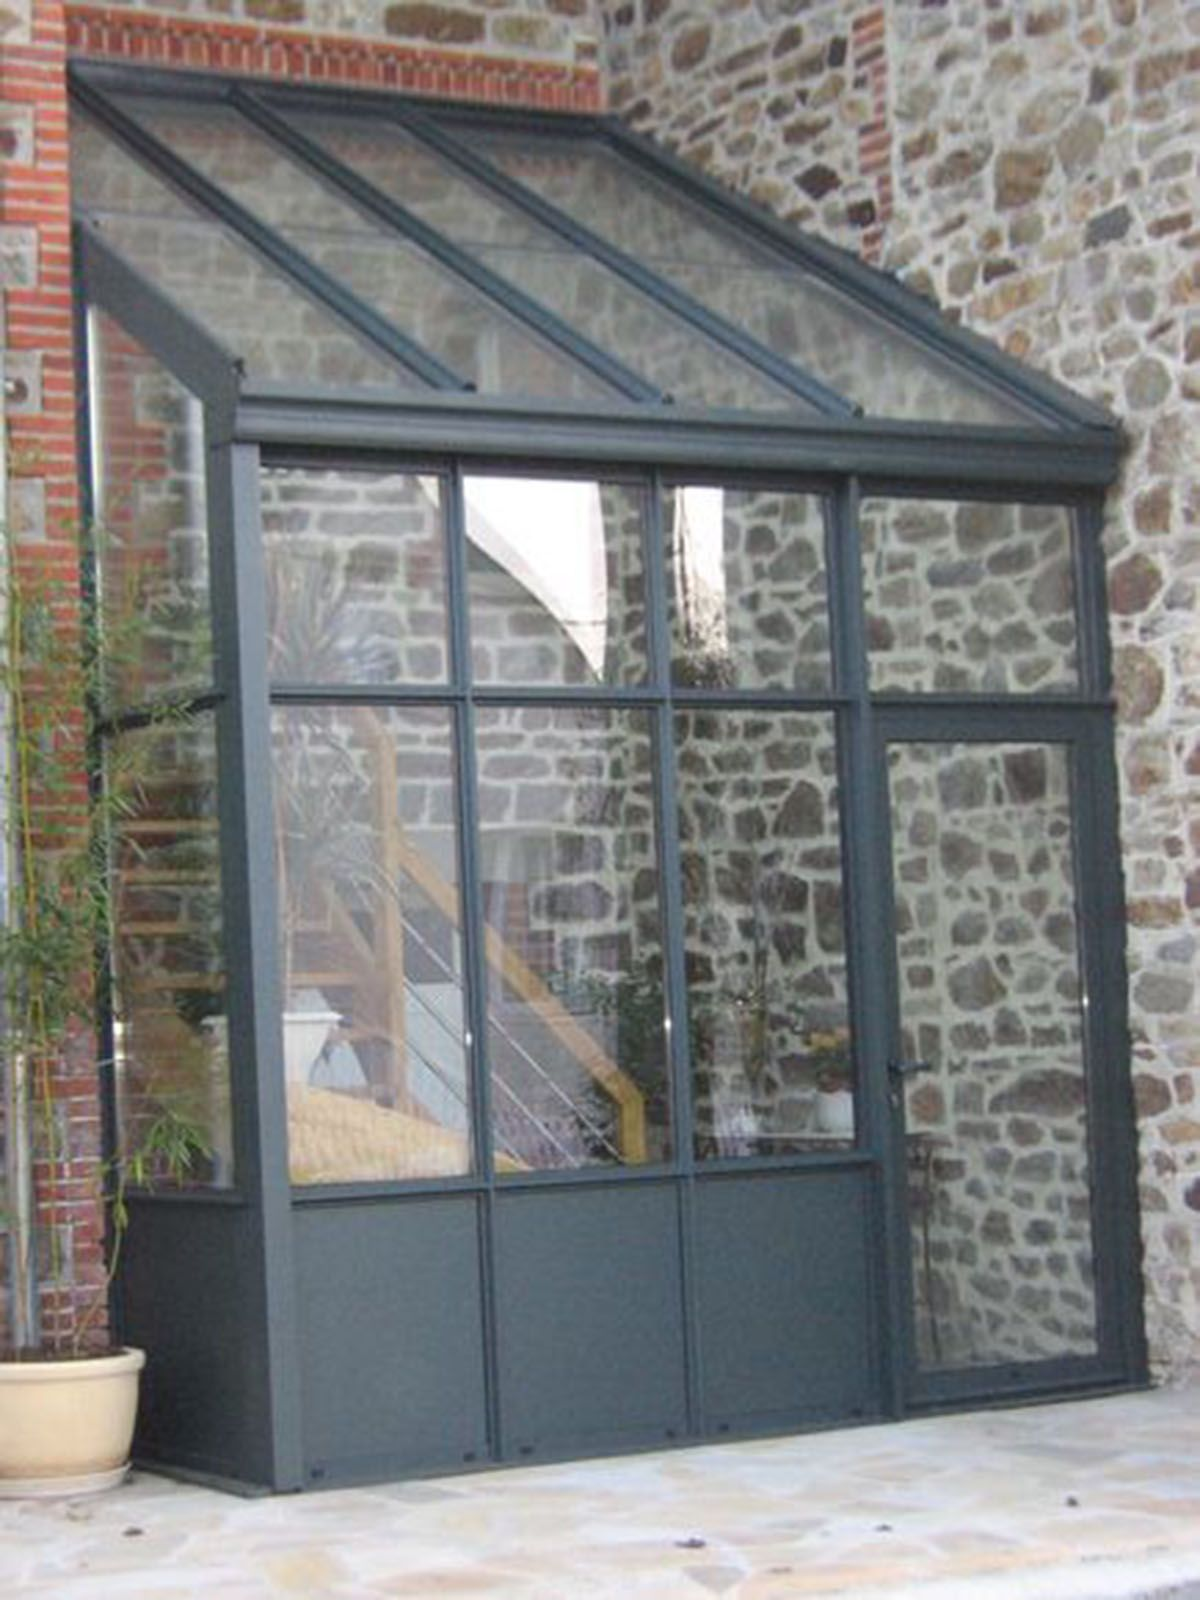 couverture veranda free couverture veranda with couverture veranda awesome vranda en bois pour. Black Bedroom Furniture Sets. Home Design Ideas